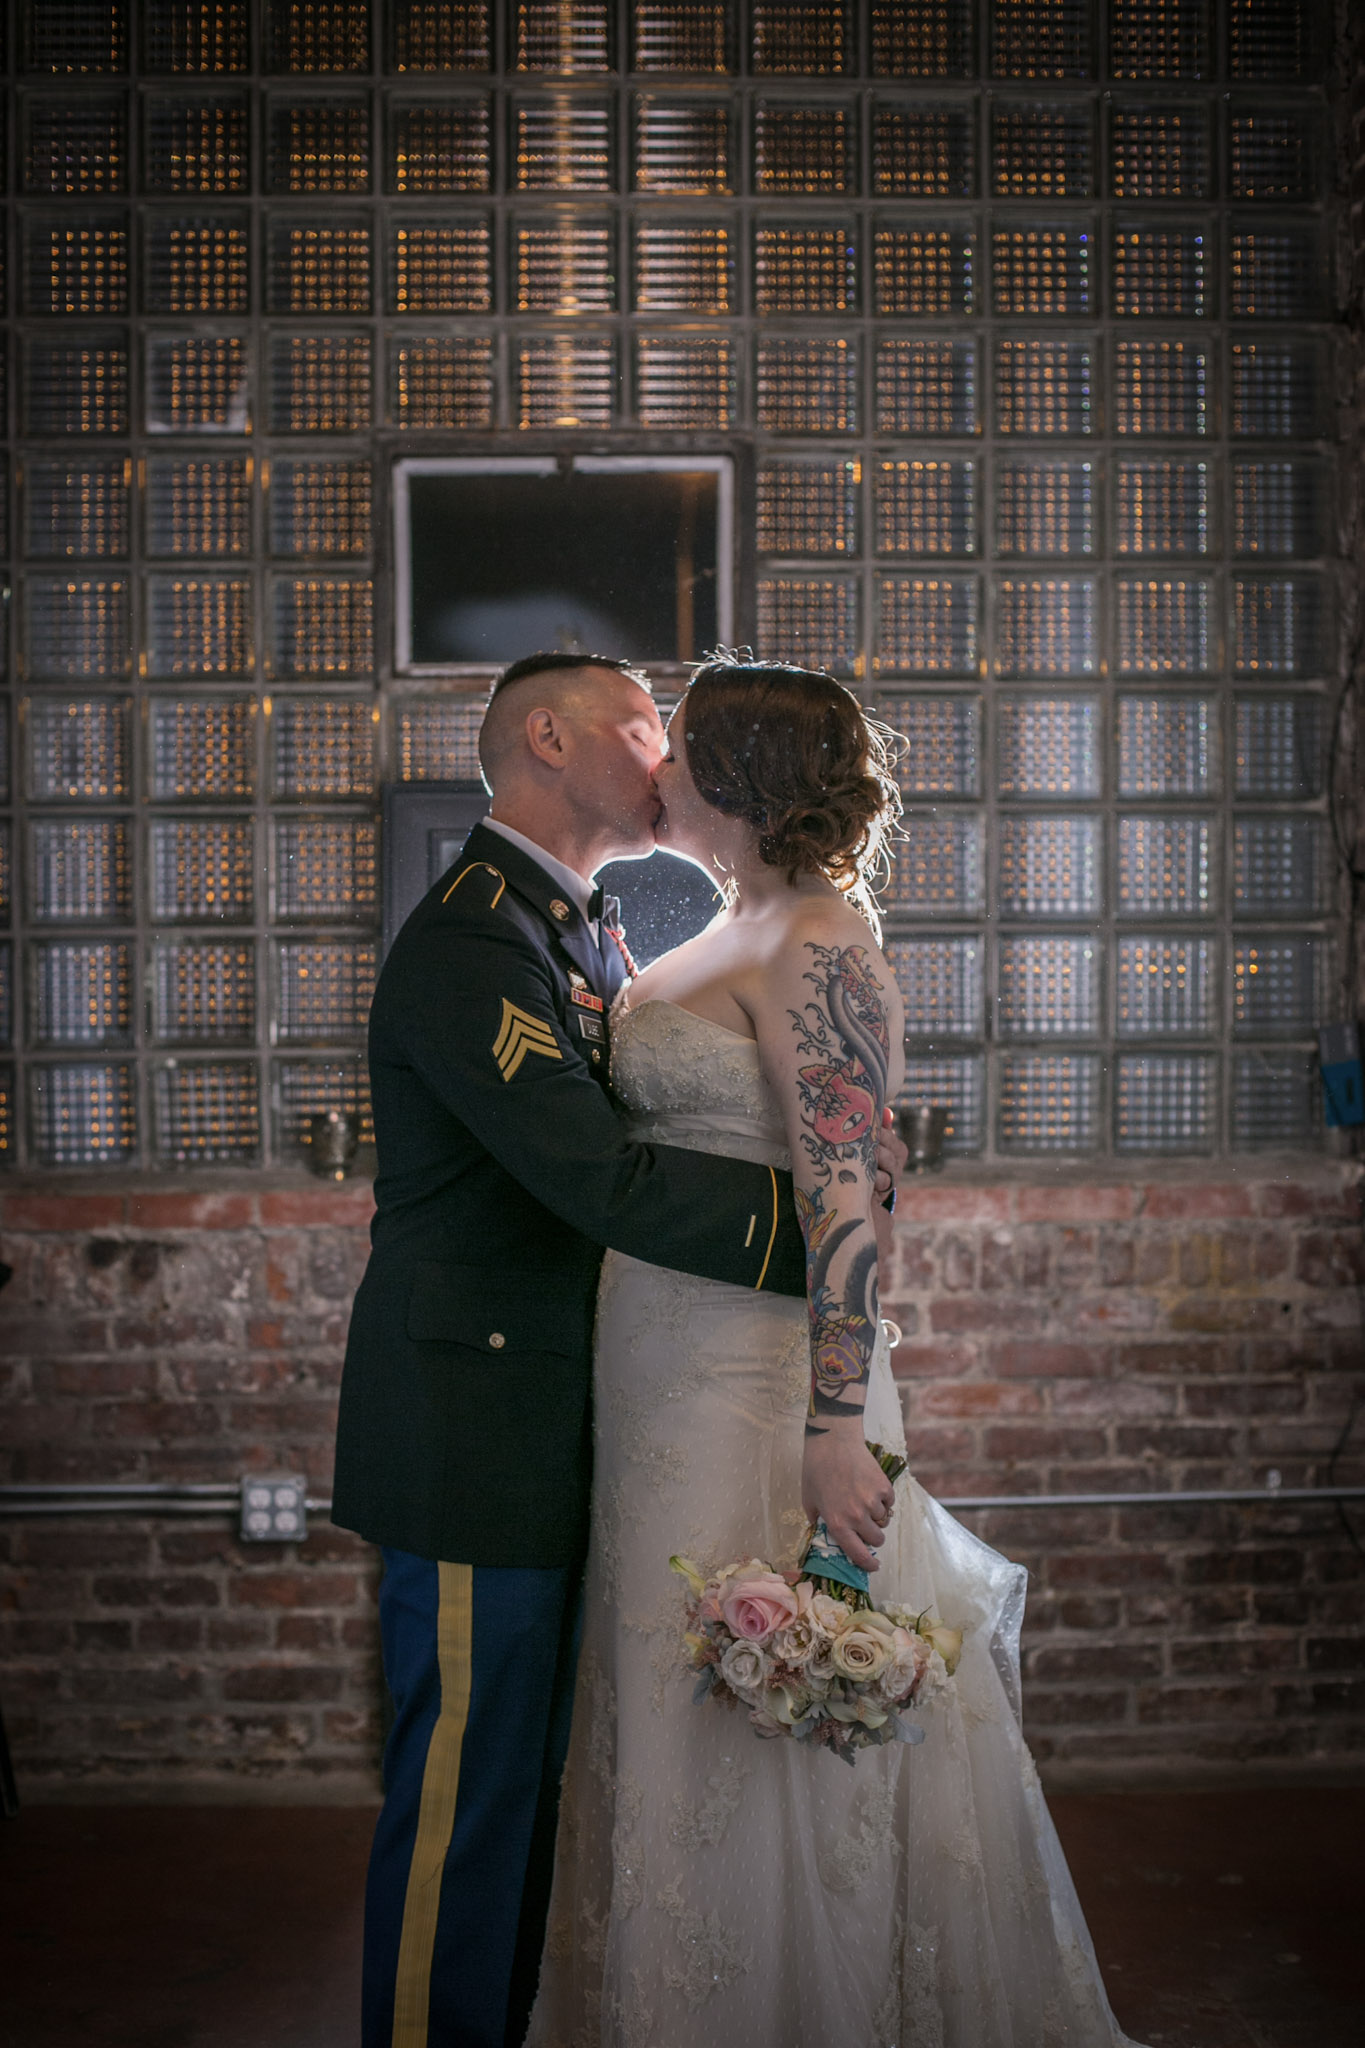 Kansas_City_Small_Wedding_Venue_Elope_Intimate_Ceremony_Budget_Affordable_Andrew&Sydney_287.jpg